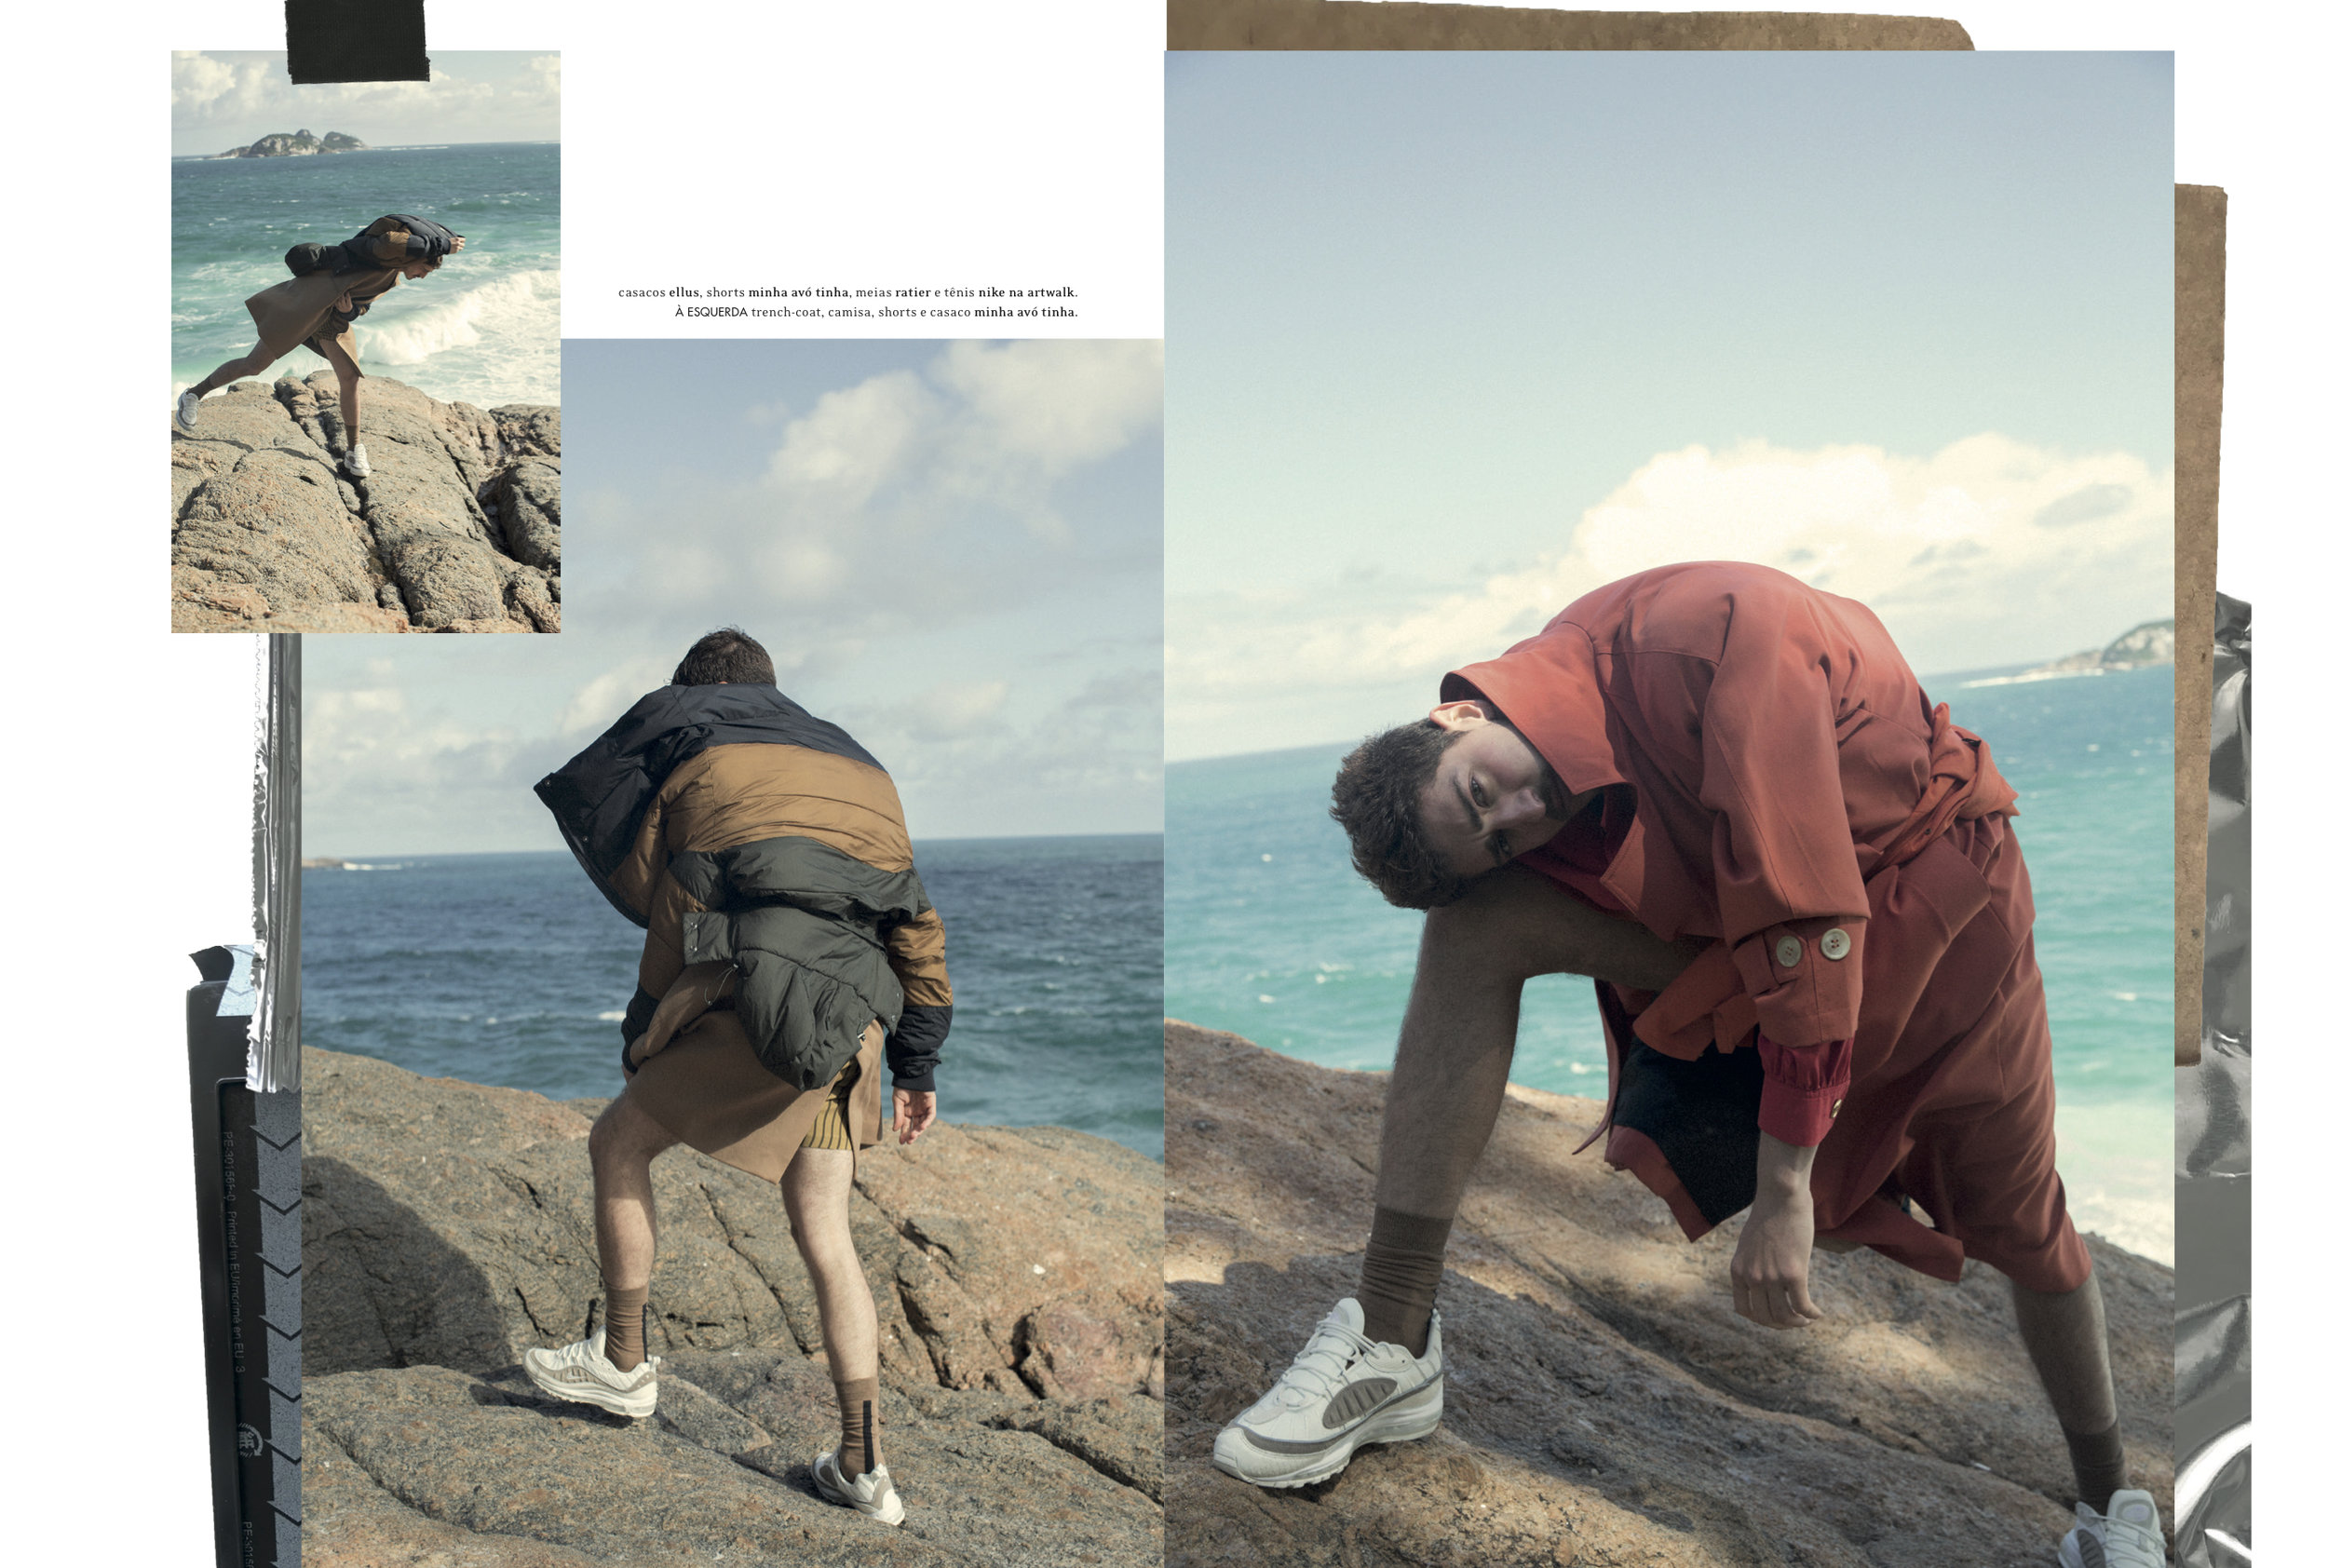 Fort Magazine_Johnny Massaro_Litmedia Productions_02.jpg